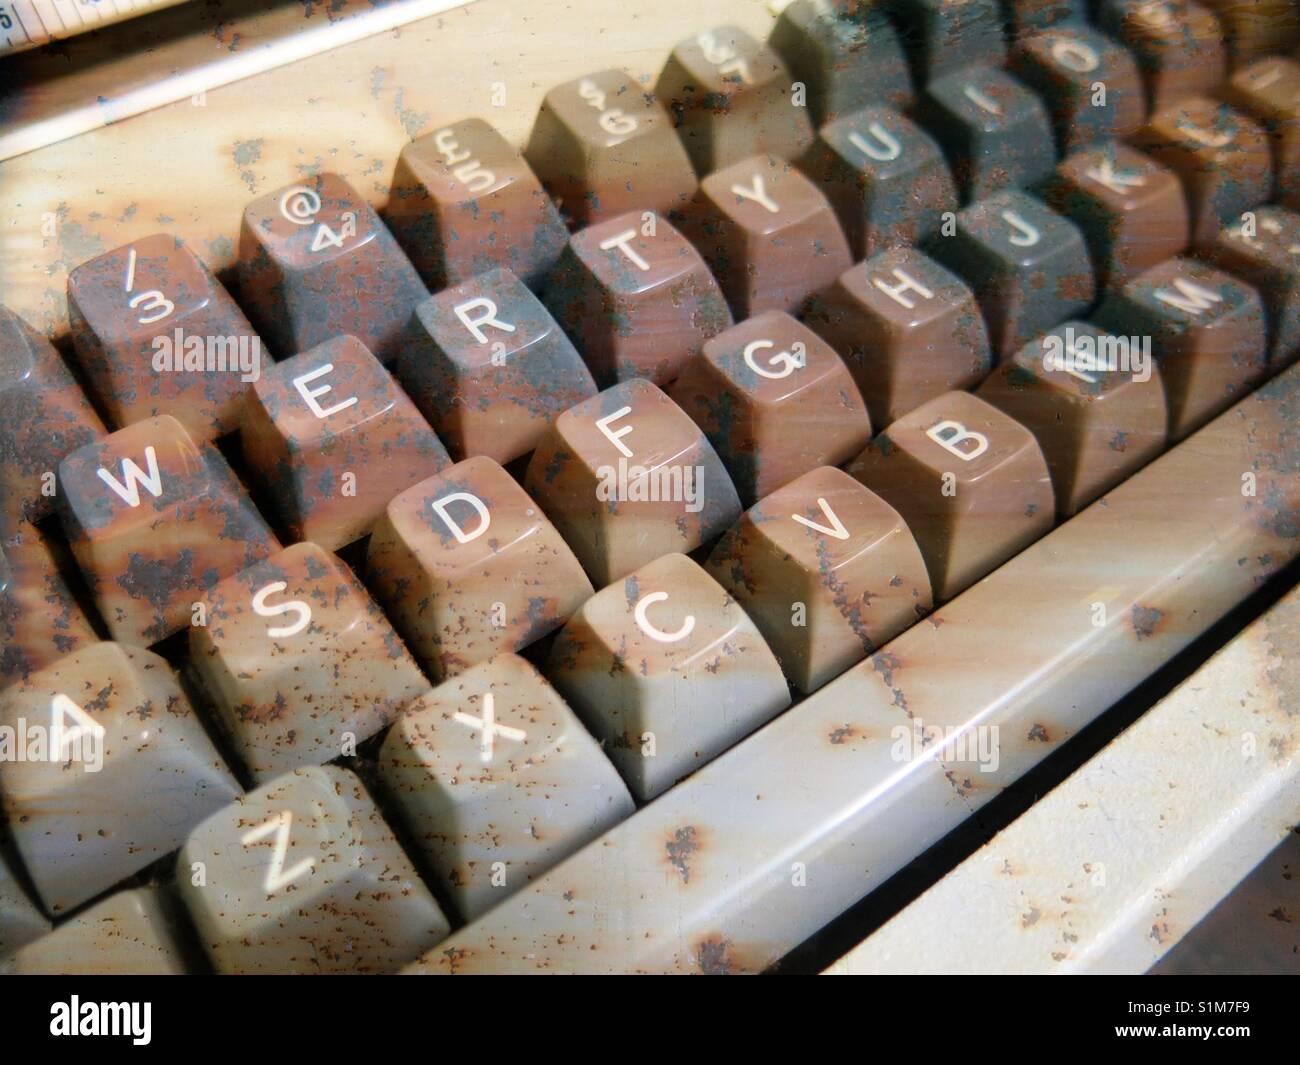 Vintage retro keyboard computer keys Stock Photo 310846237